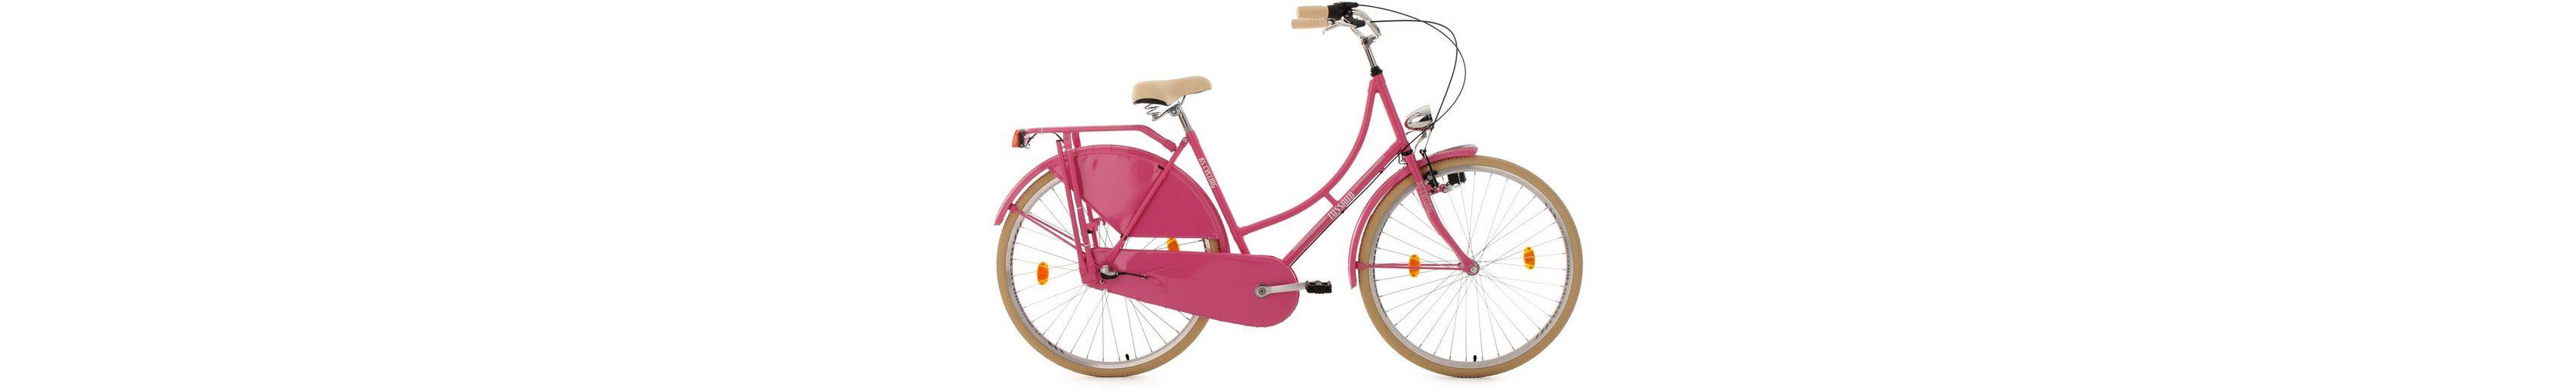 KS Cycling Hollandrad, 28 Zoll, pink, 3-Gang-Shimano-Nexus-Nabenschaltung, »Tussaud«